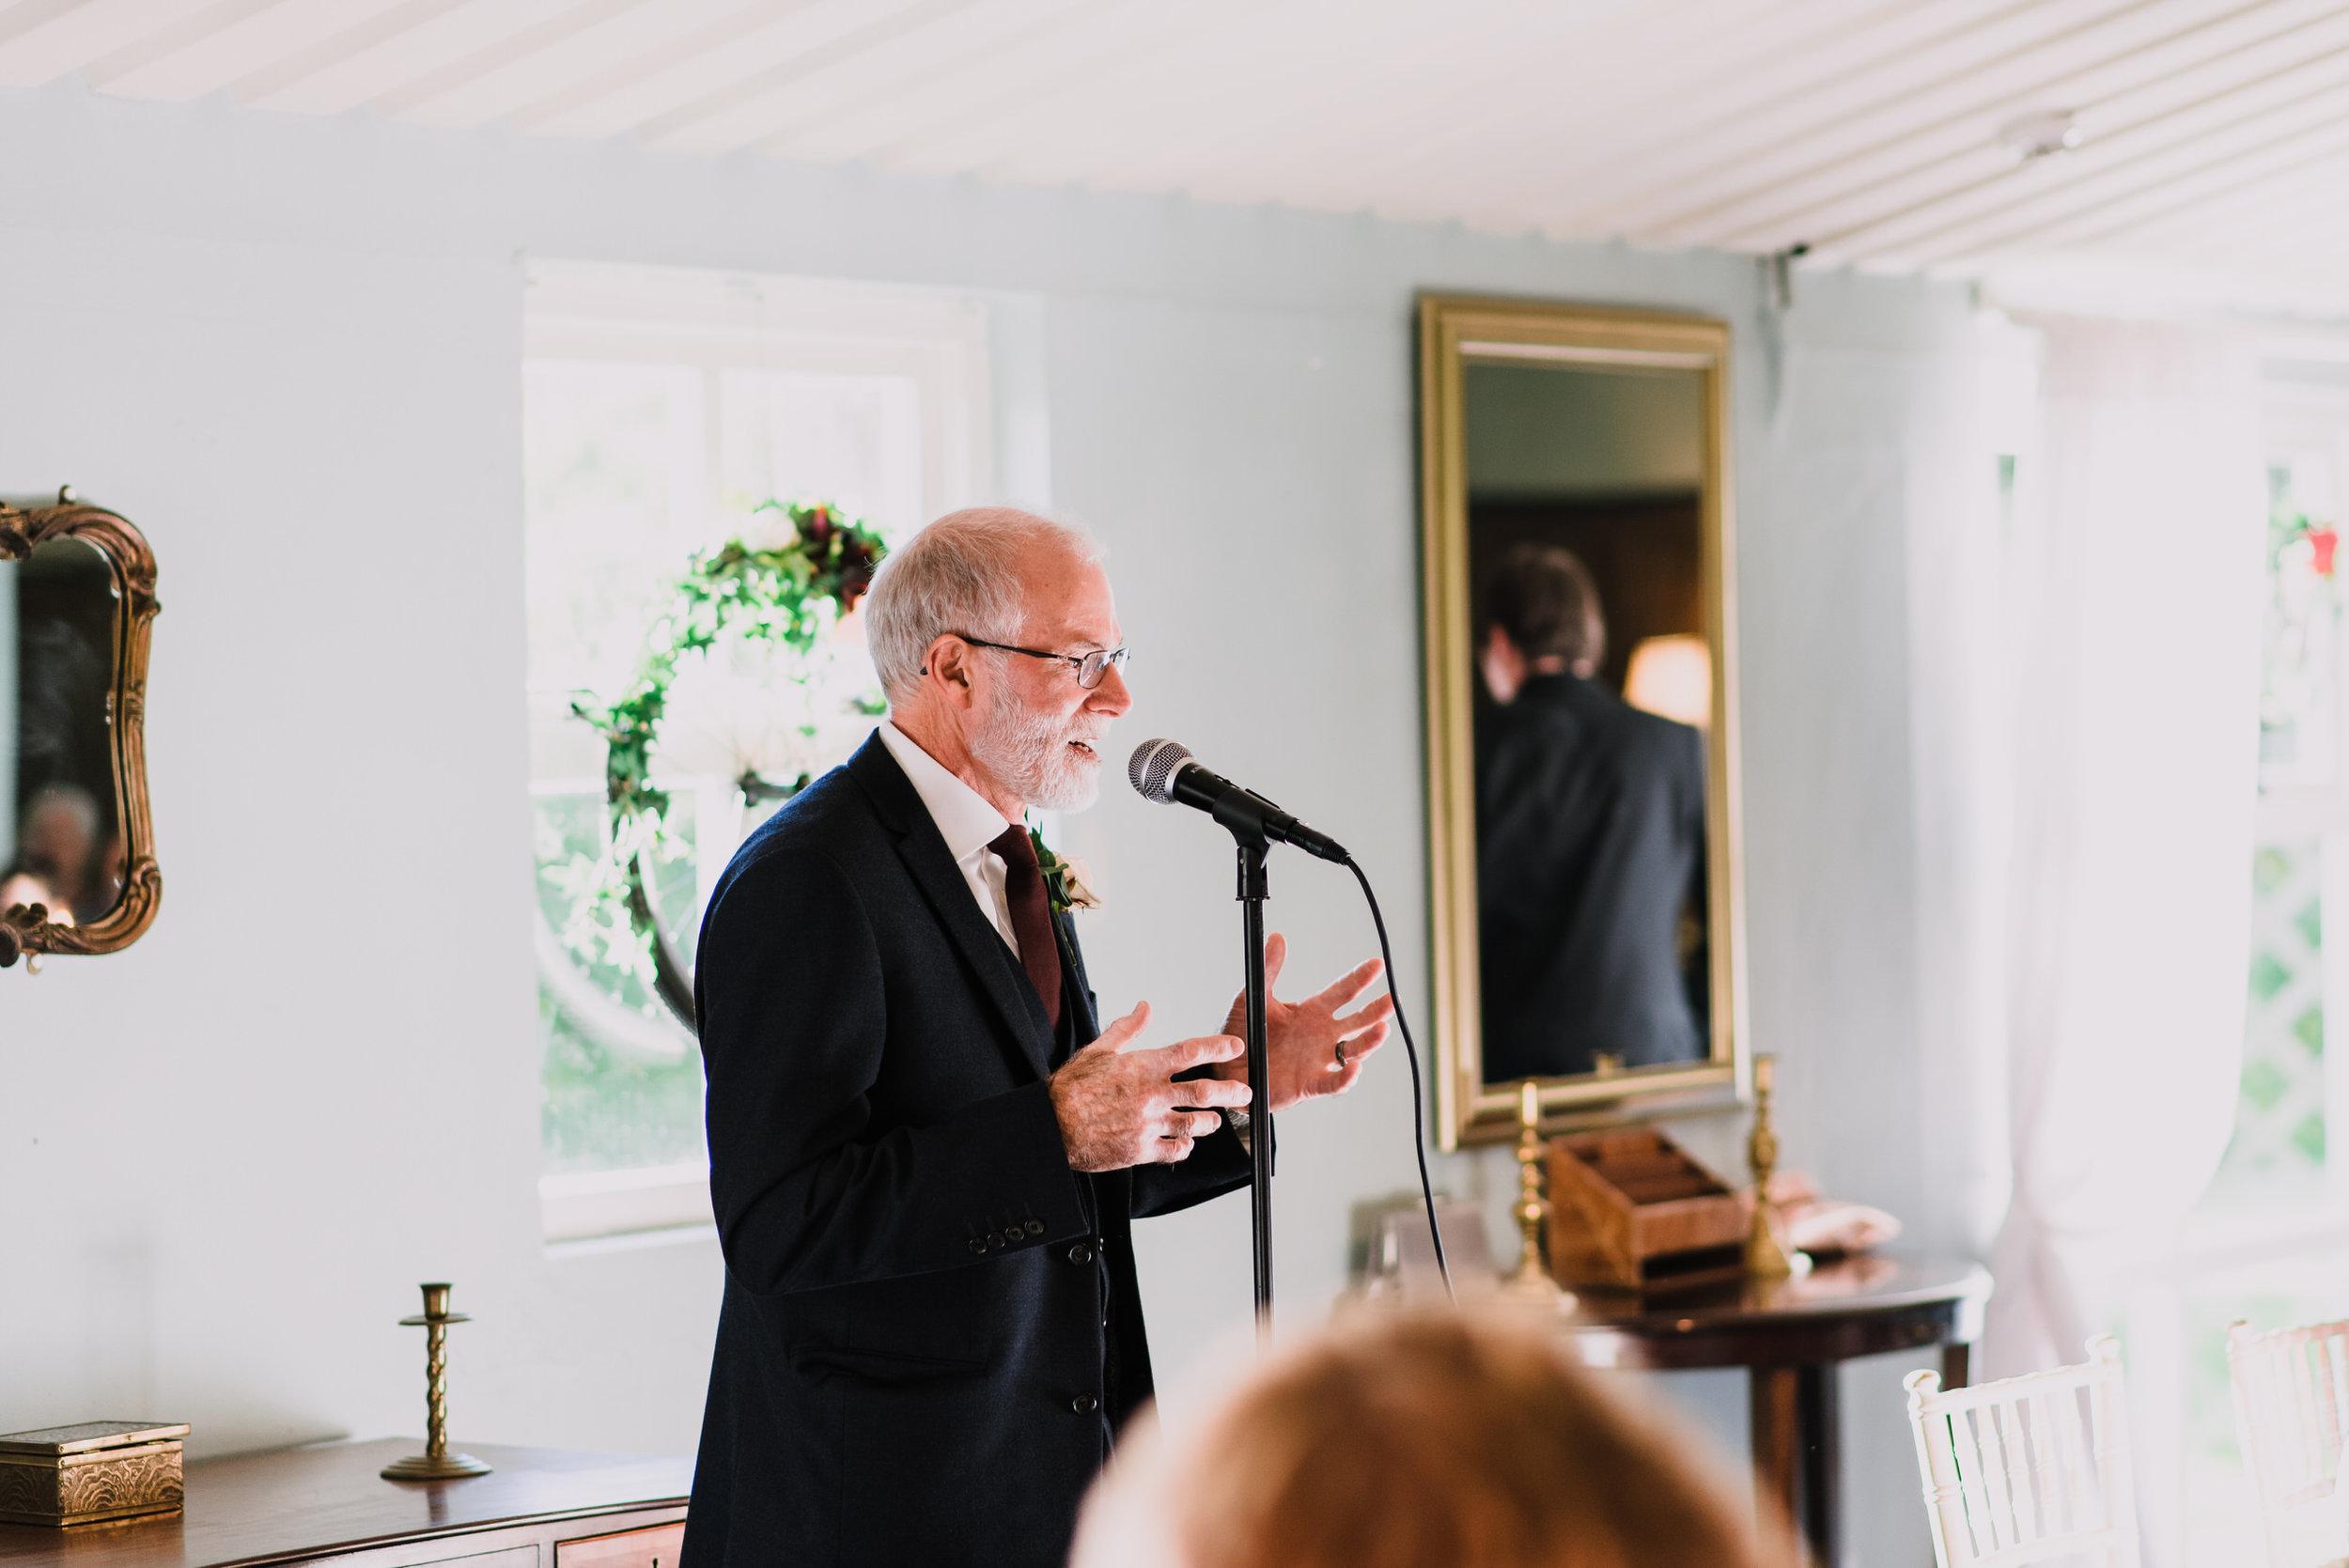 lissanoure castle wedding, northern ireland wedding photographer, romantic northern irish wedding venue, castle wedding ireland, natural wedding photography ni (106).jpg